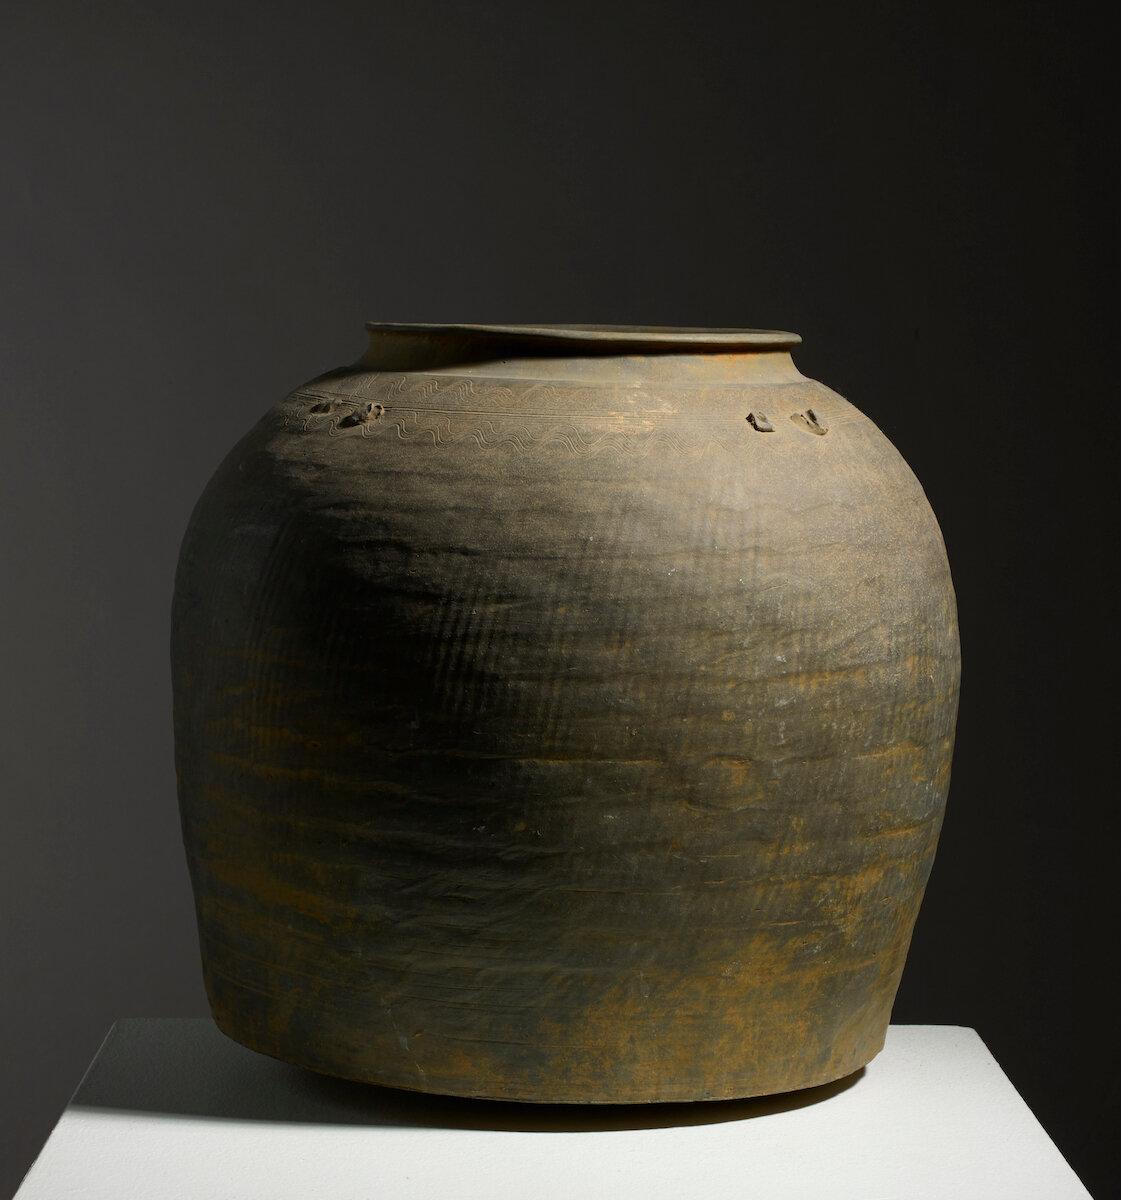 Pot, Vietnam, dynastie des Lê, 15°-16° siècle